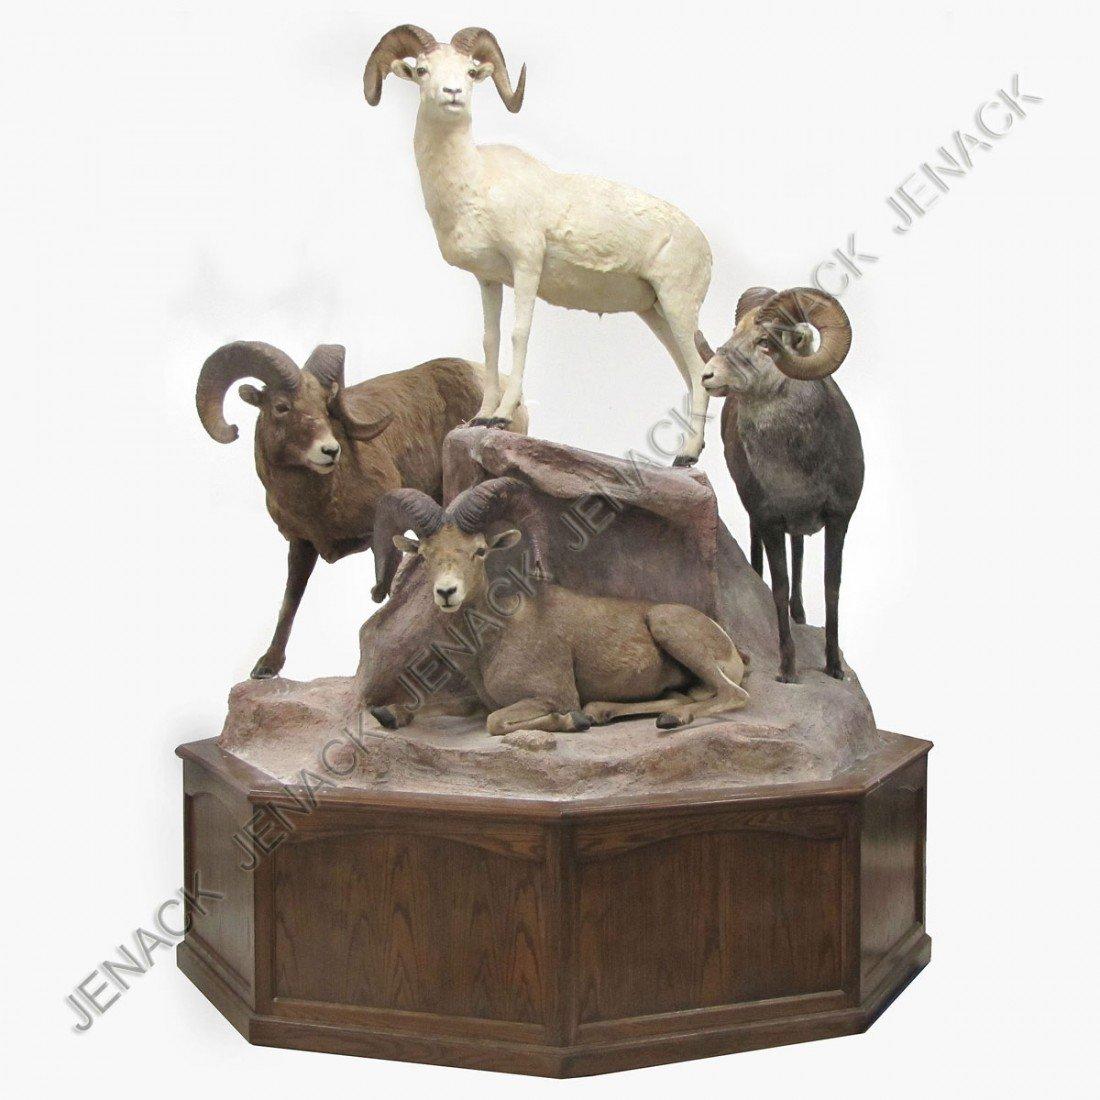 147: RARE GRAND SLAM MOUNT, BIG HORN SHEEP